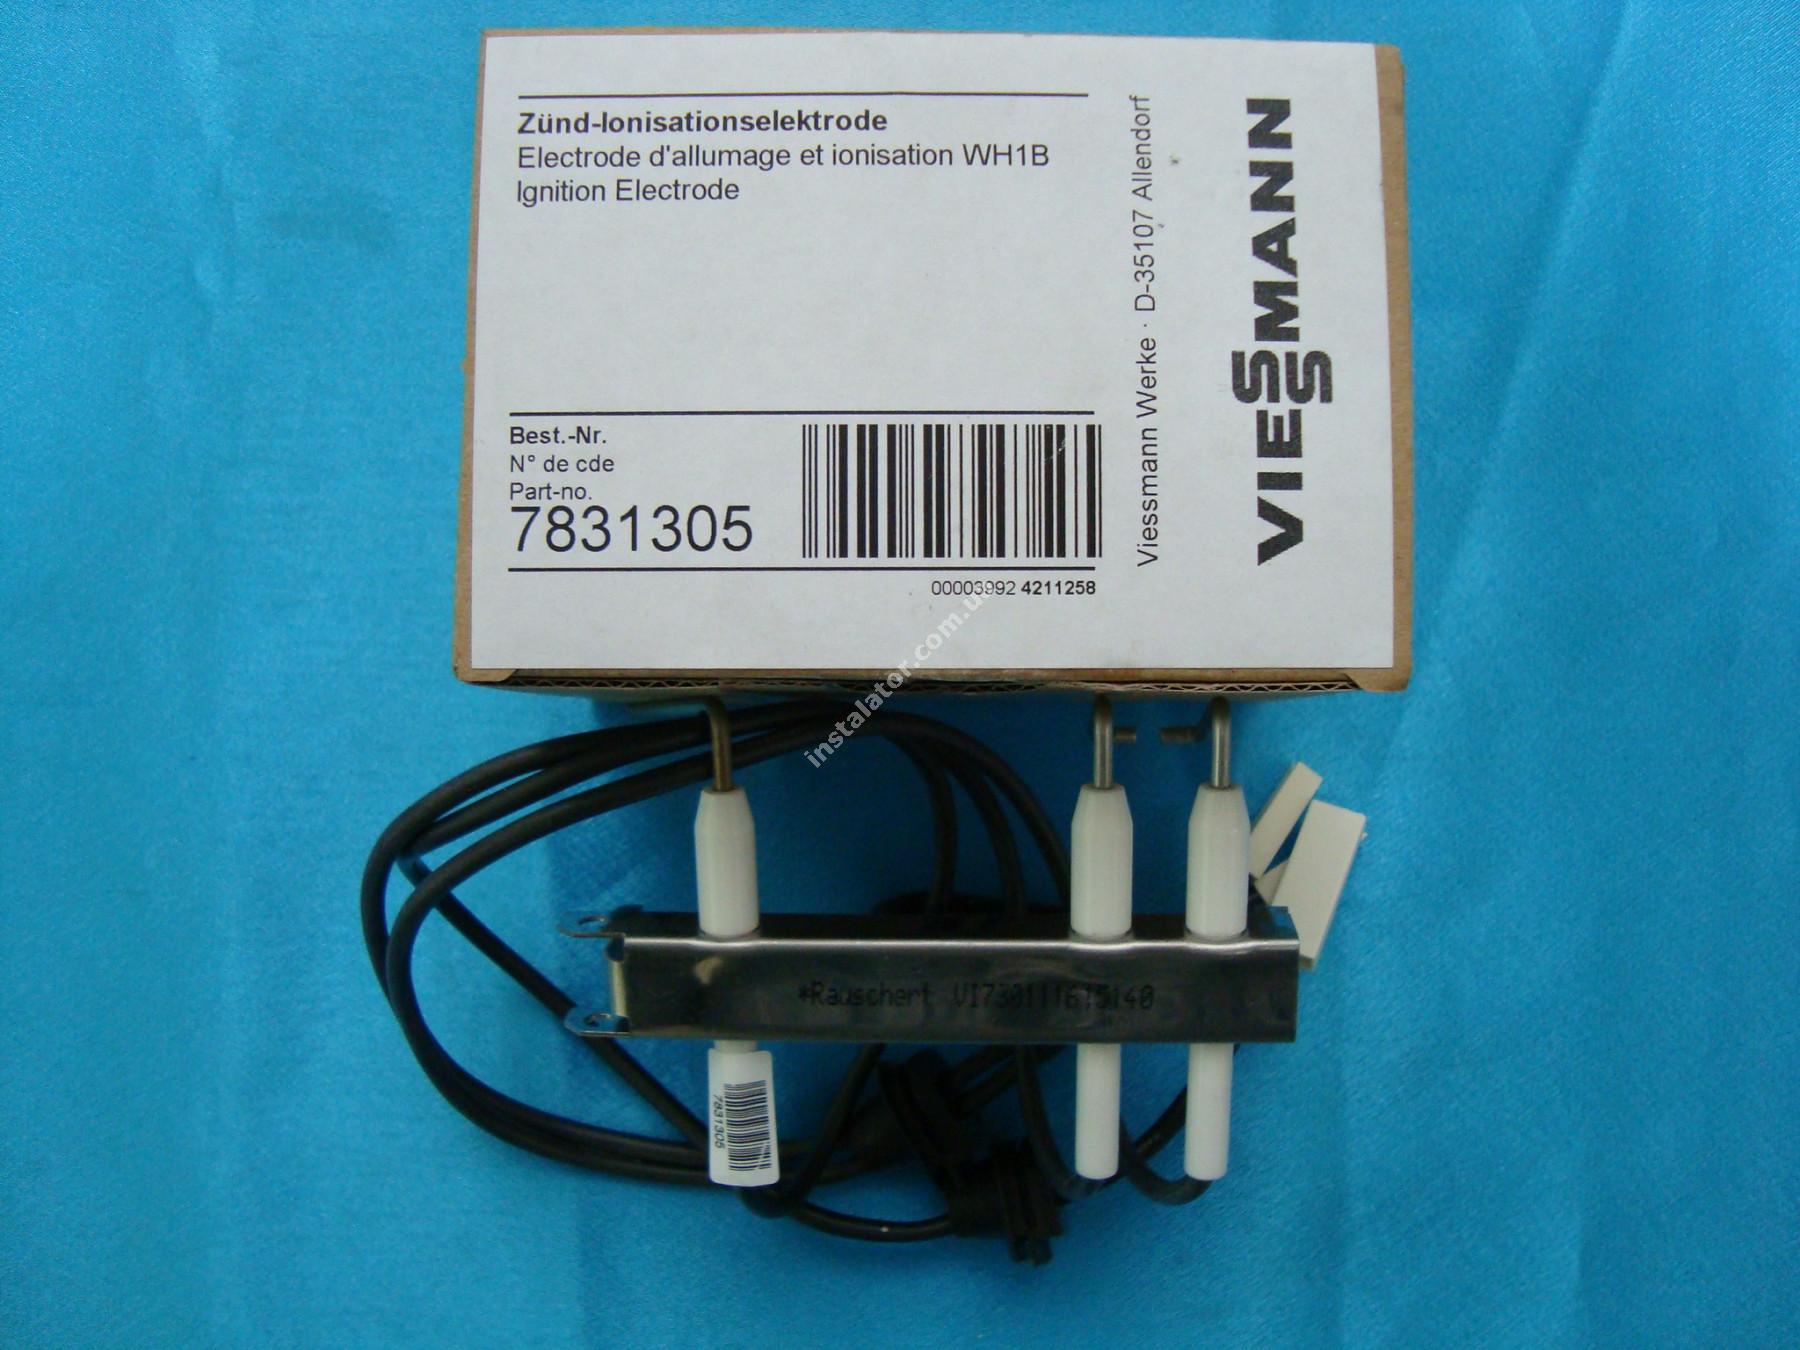 7831305 Електрод іонізації та розпалу Viessmann WH1B full-image-1